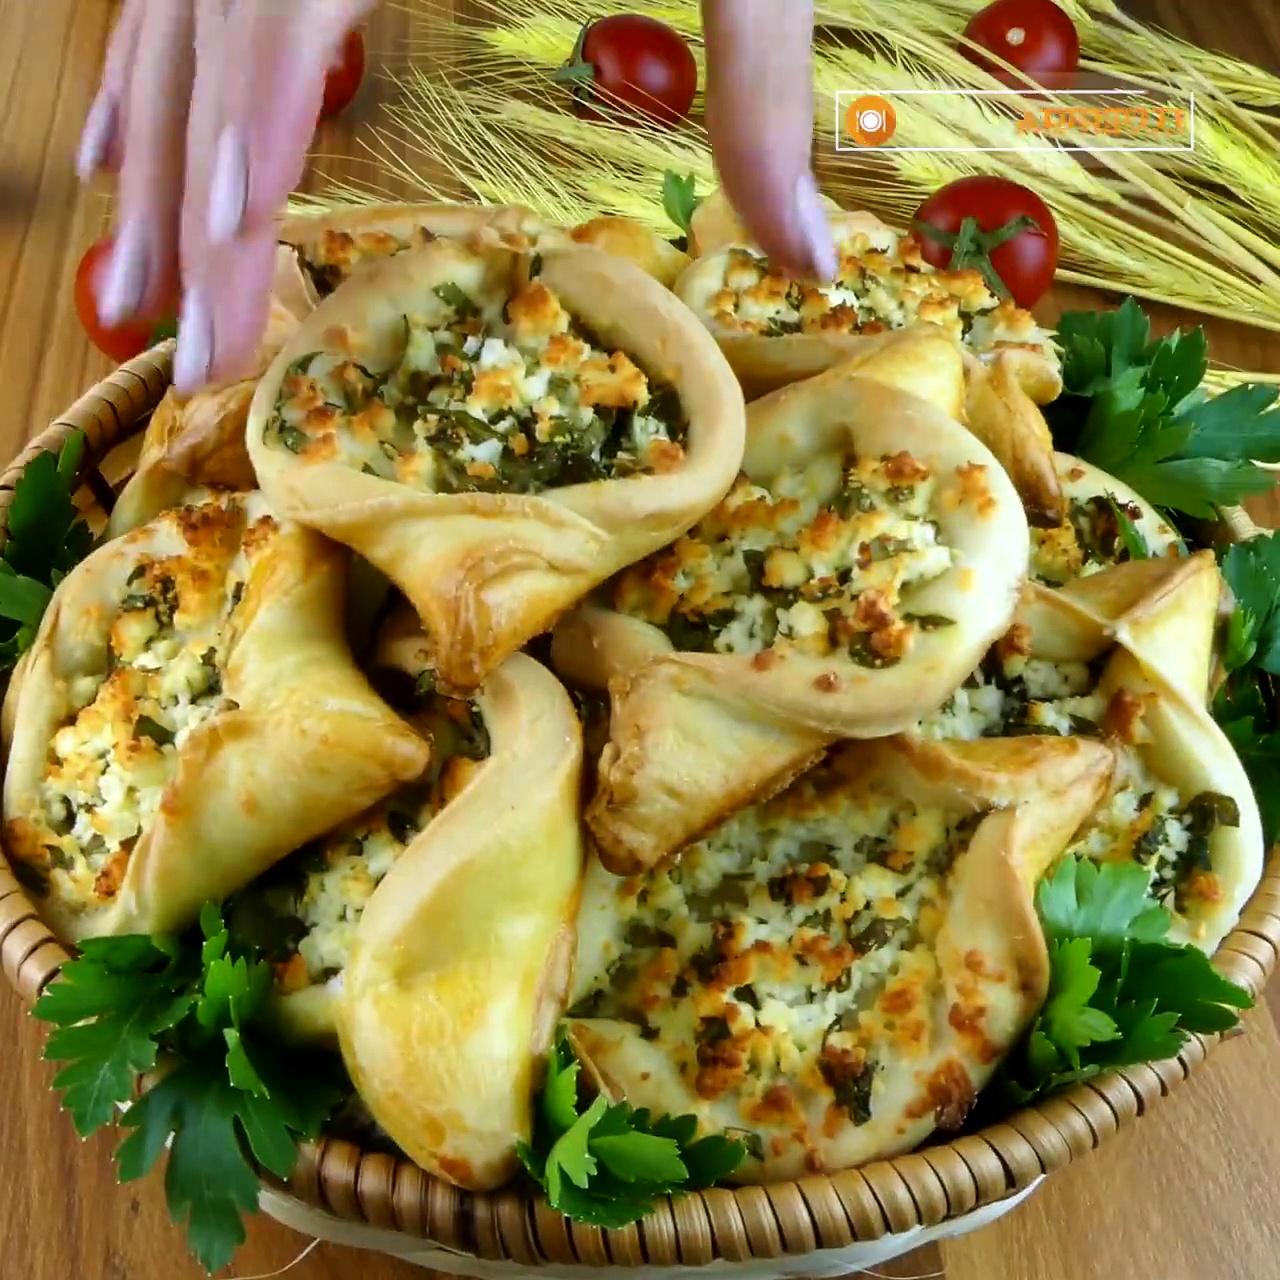 Лодочки с сыром фета! Быстрый и вкусный рецепт/Boats with feta cheese! Quick and delicious recipe